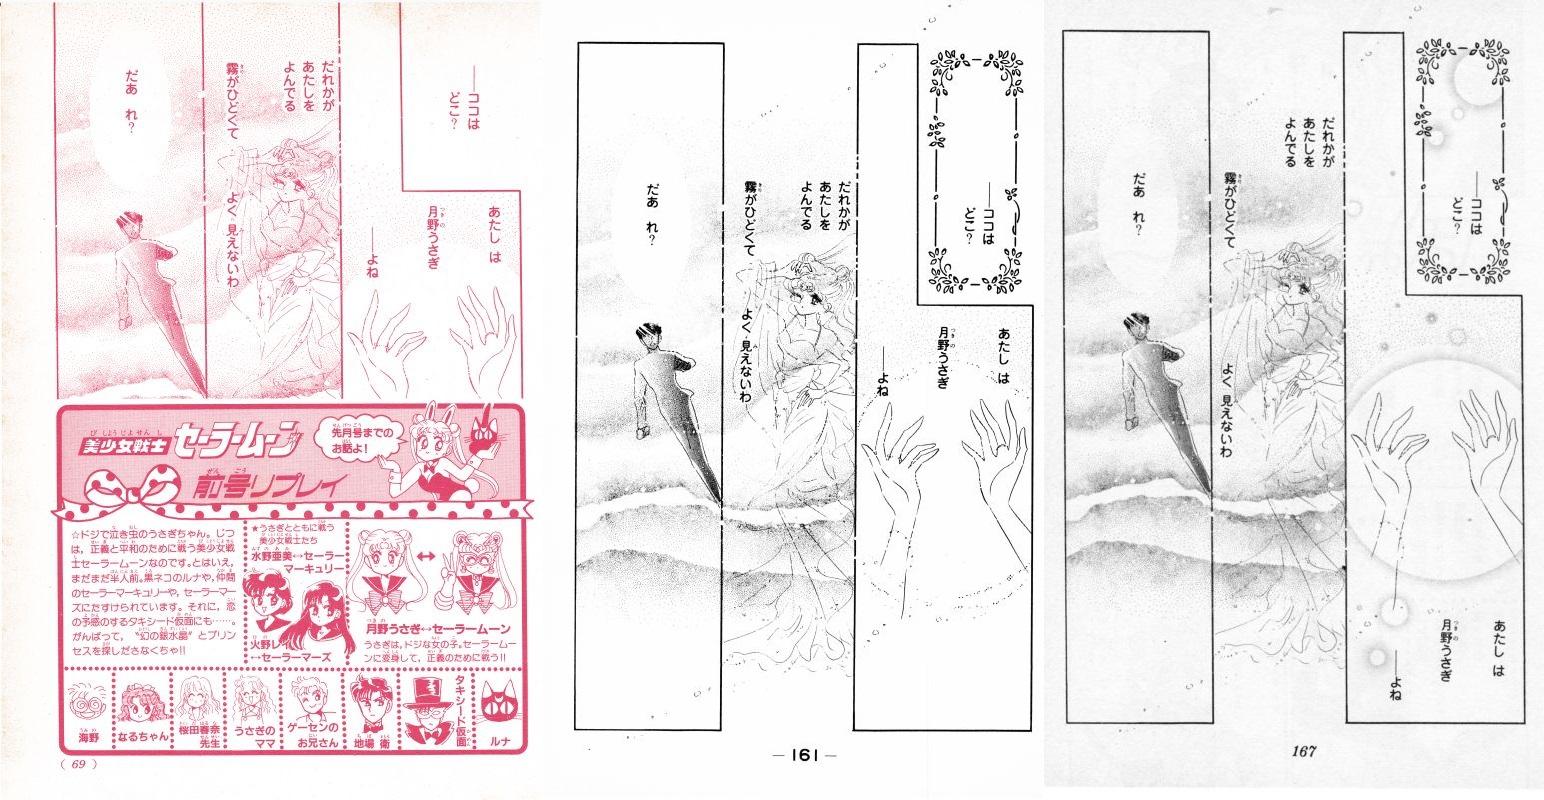 Act 5, Page 1 – Nakayoshi, Original, Remaster